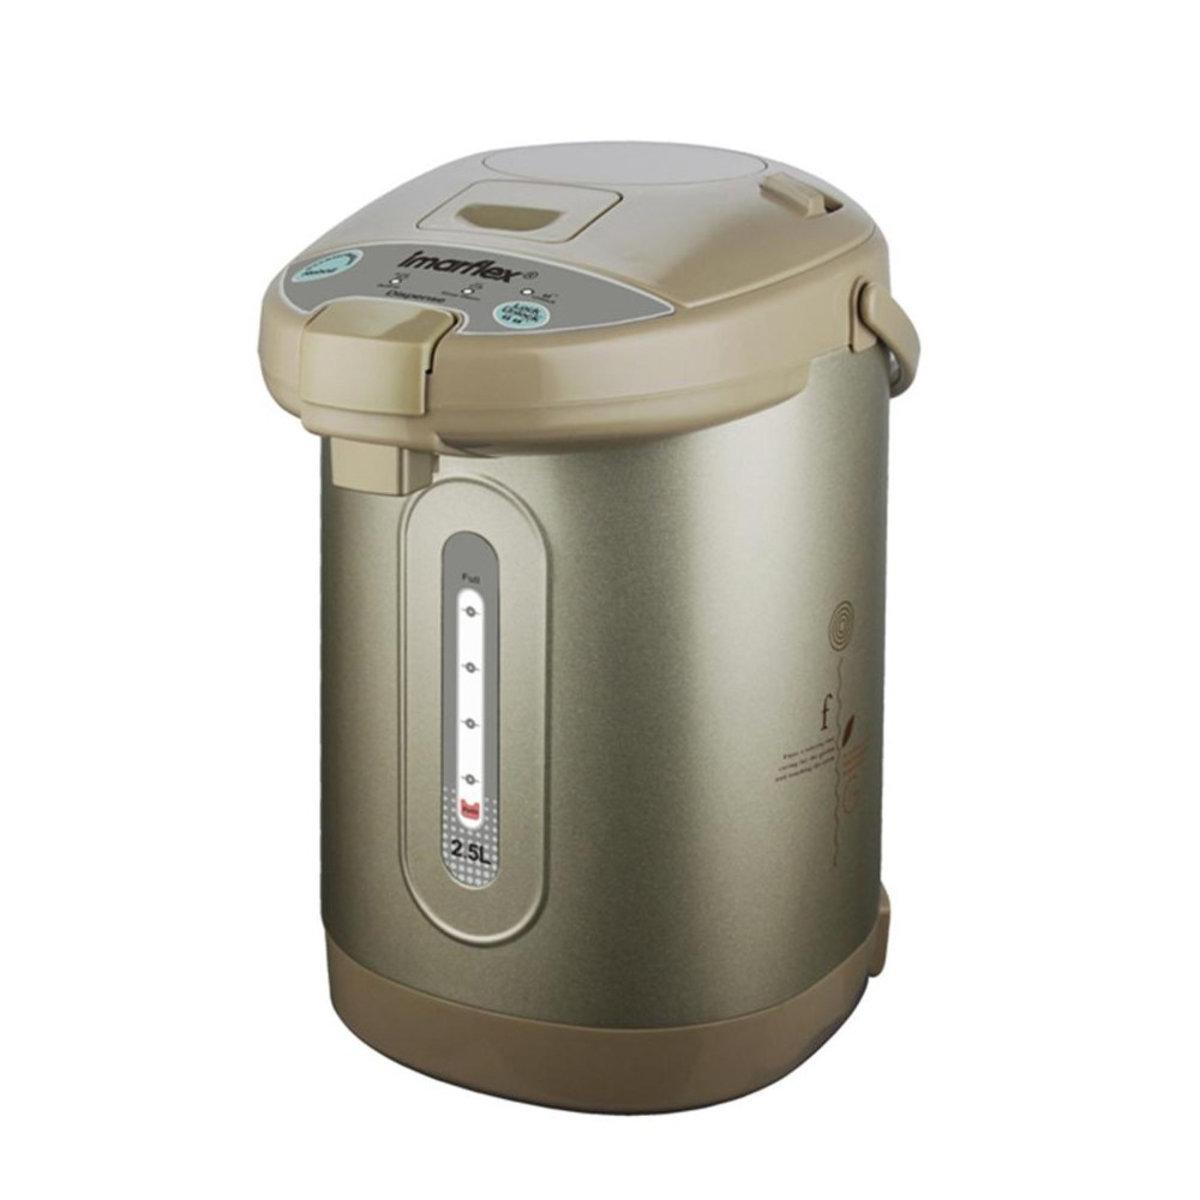 2.5L Thermo Pot - IAP-25G